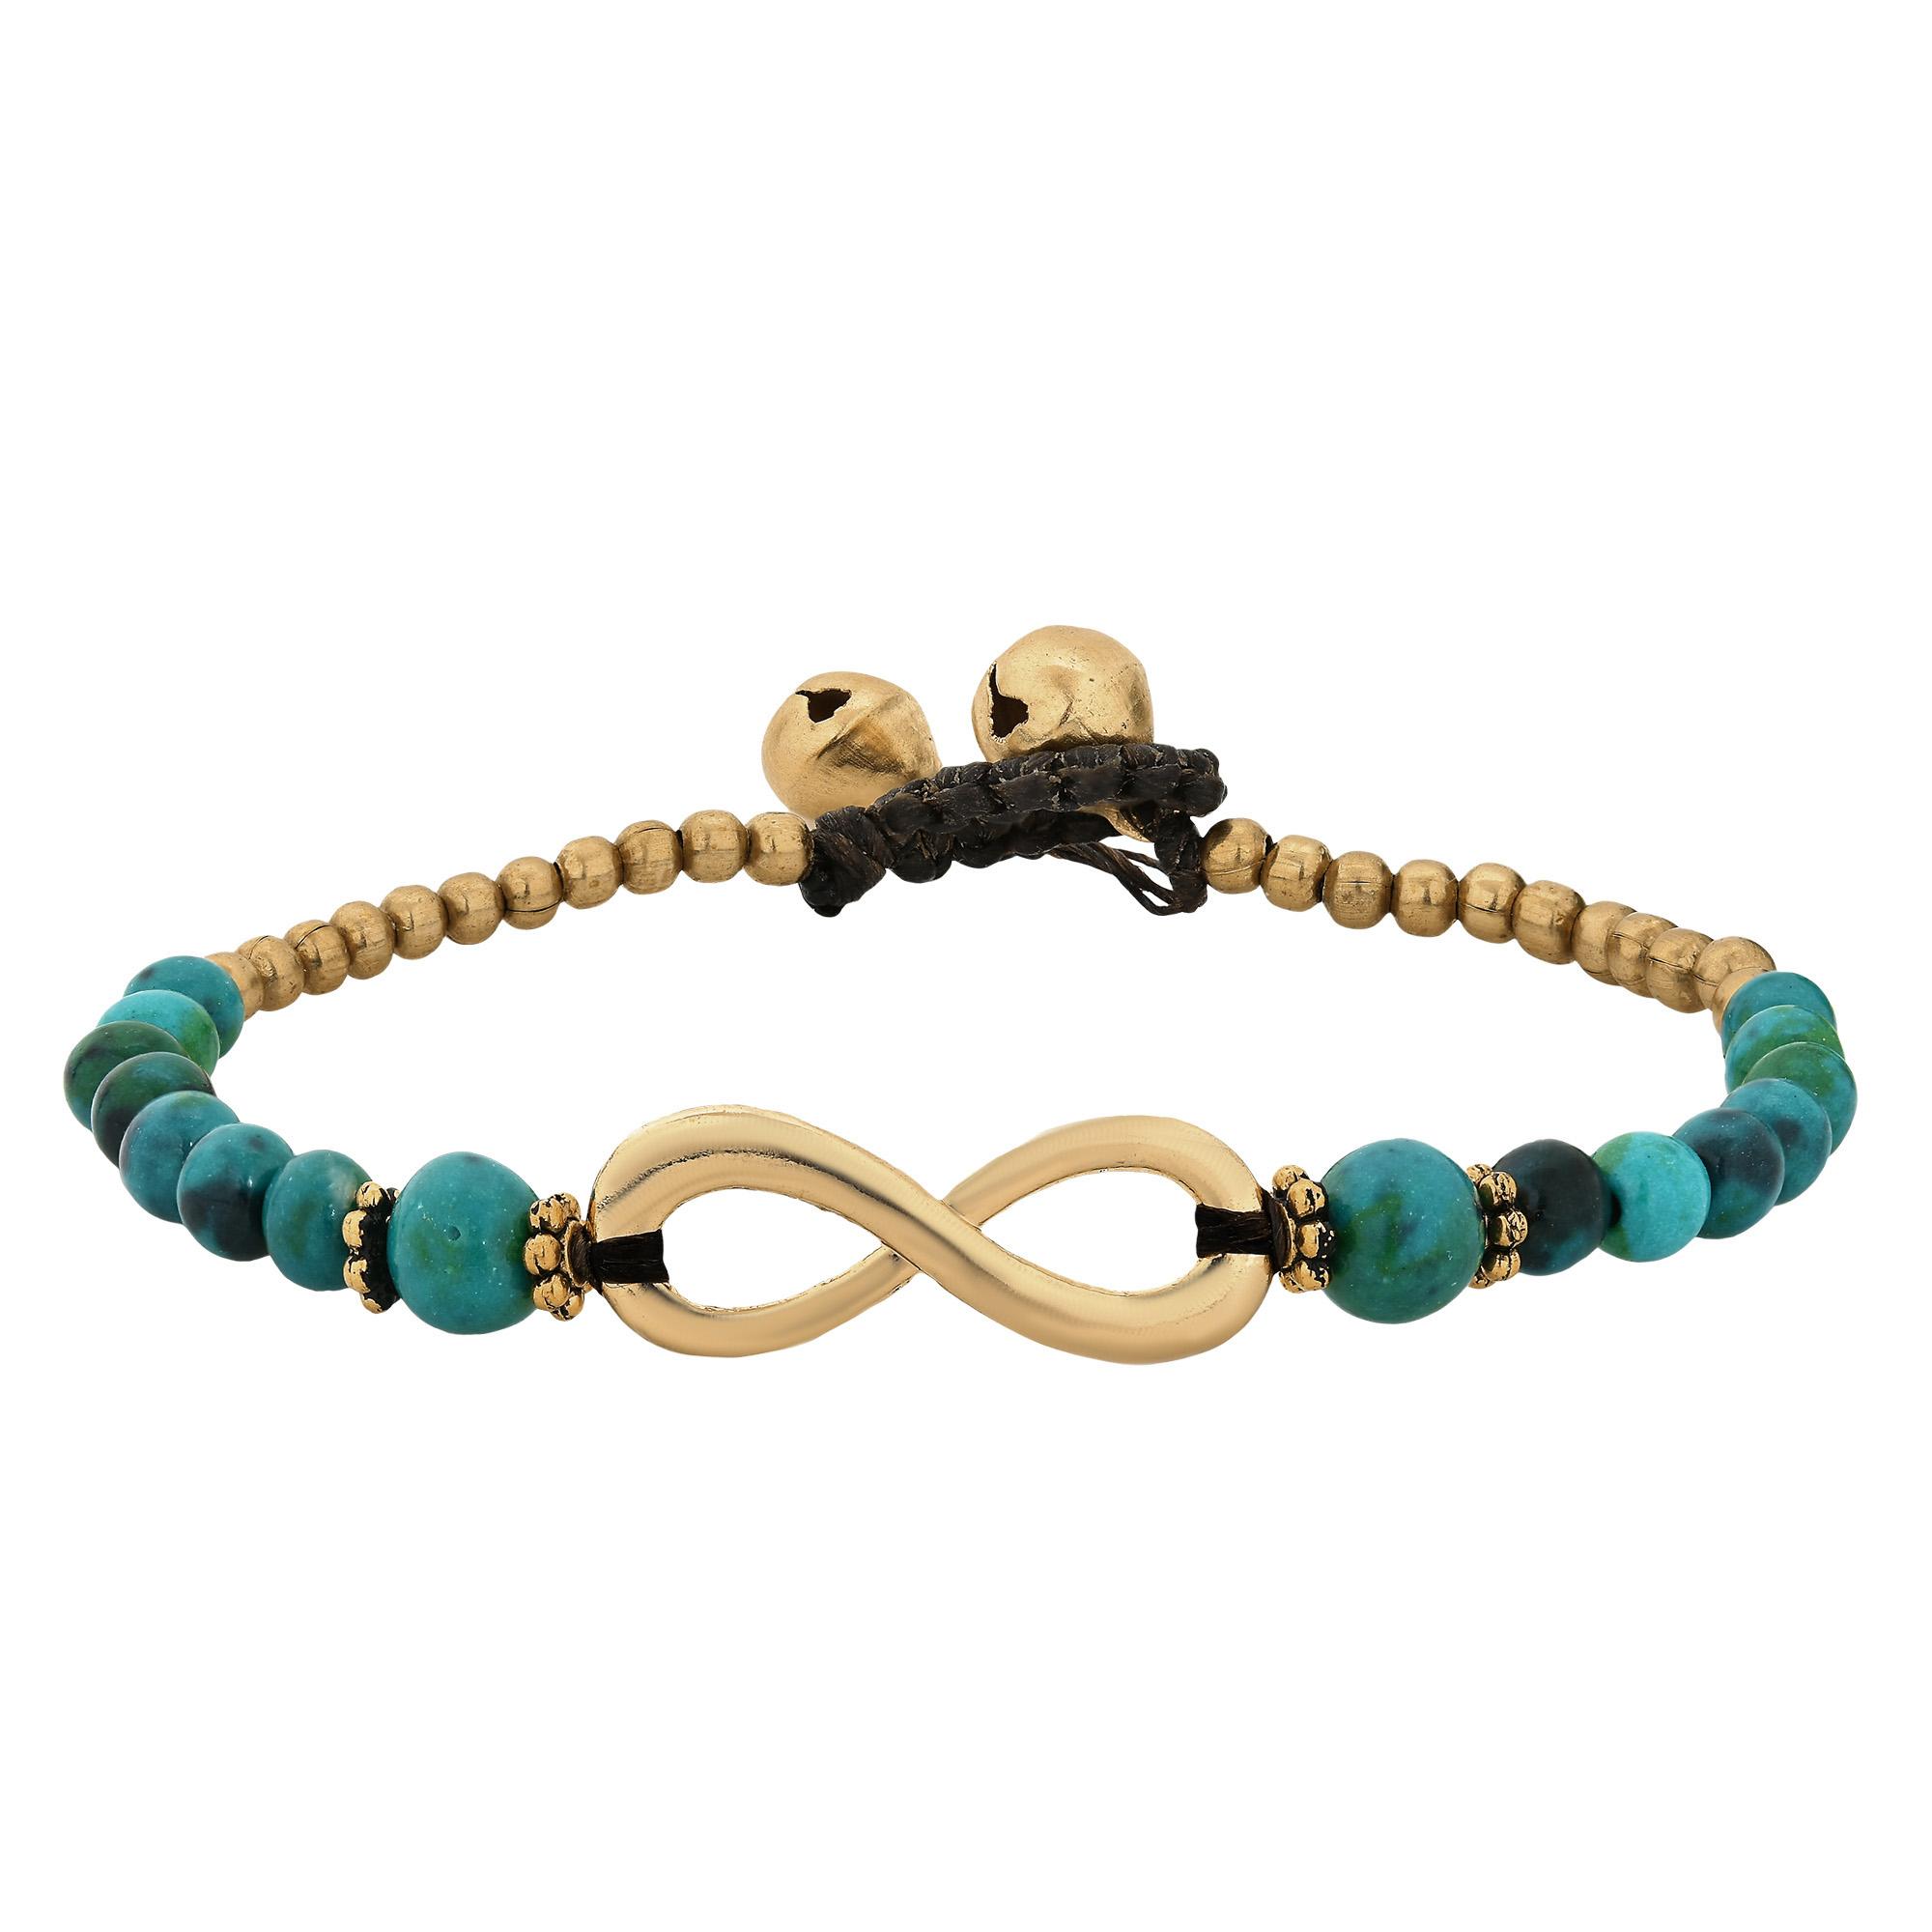 Beautiful Infinity Symbol With Green Malachite Brass Beads Handmade